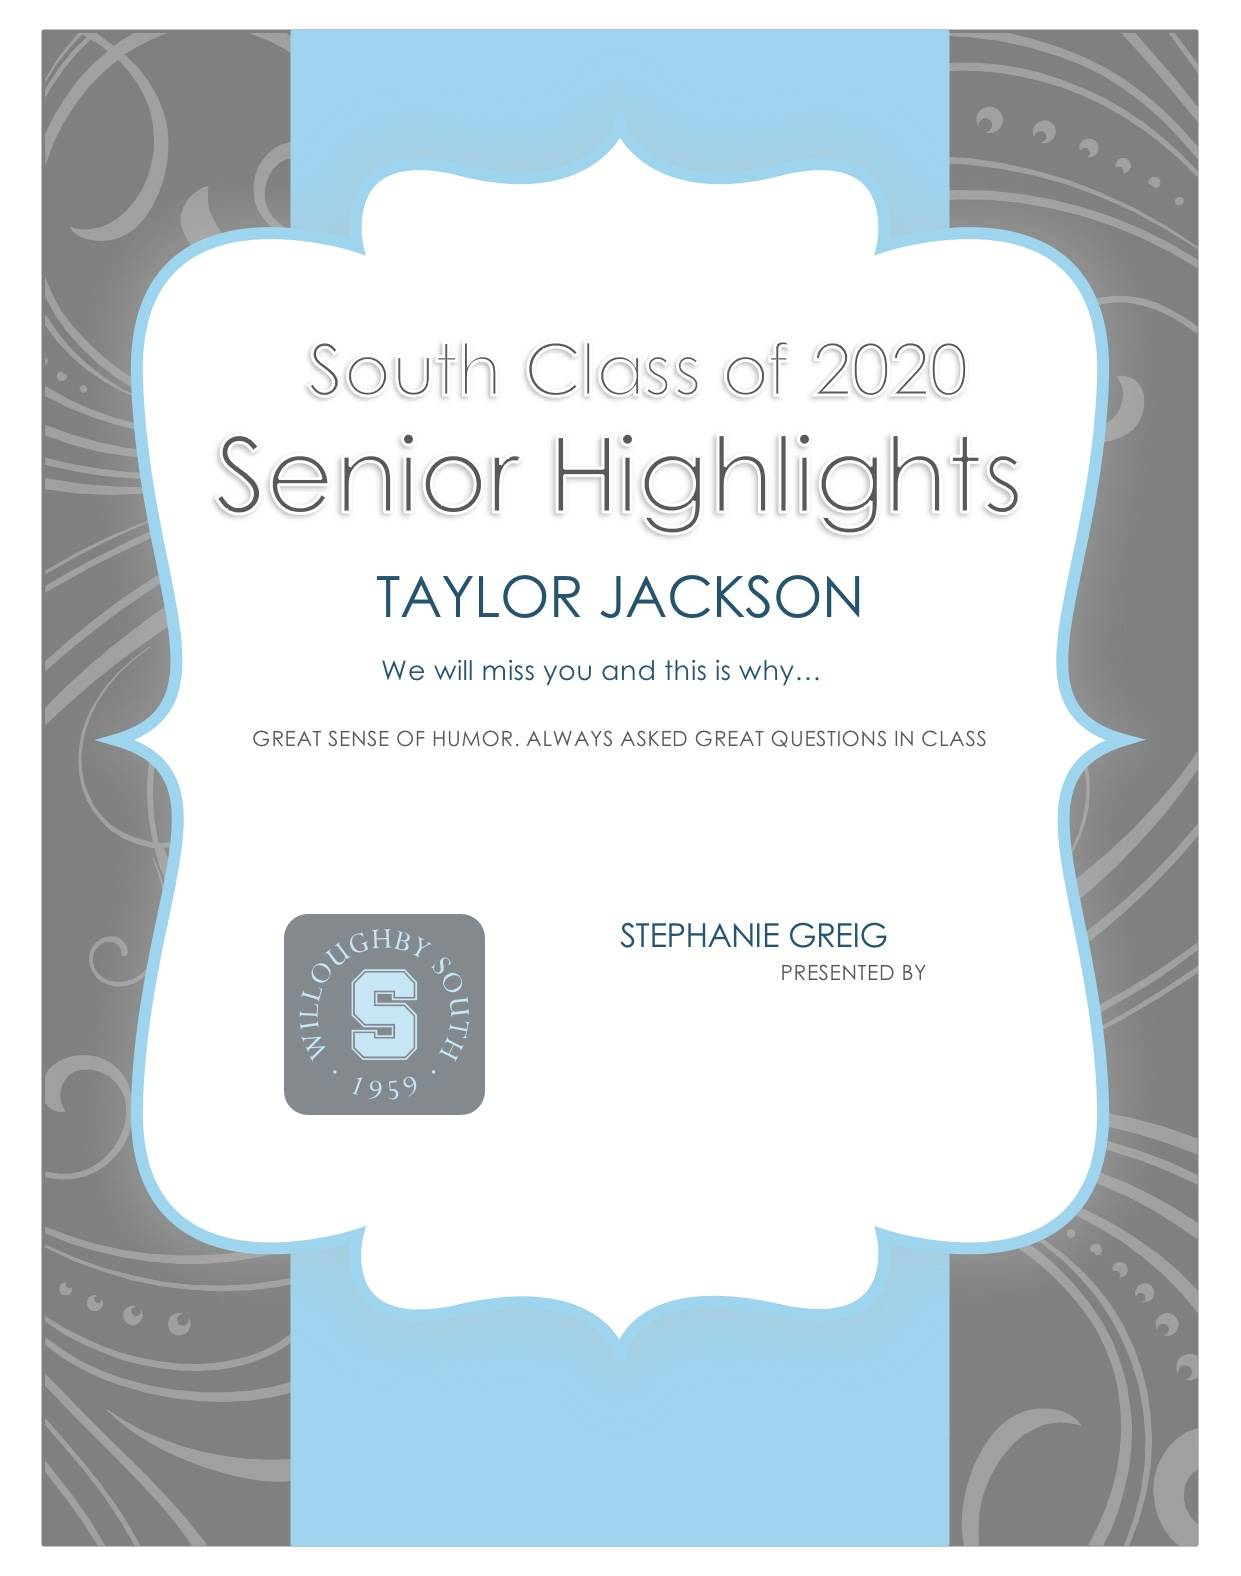 Taylor Jackson